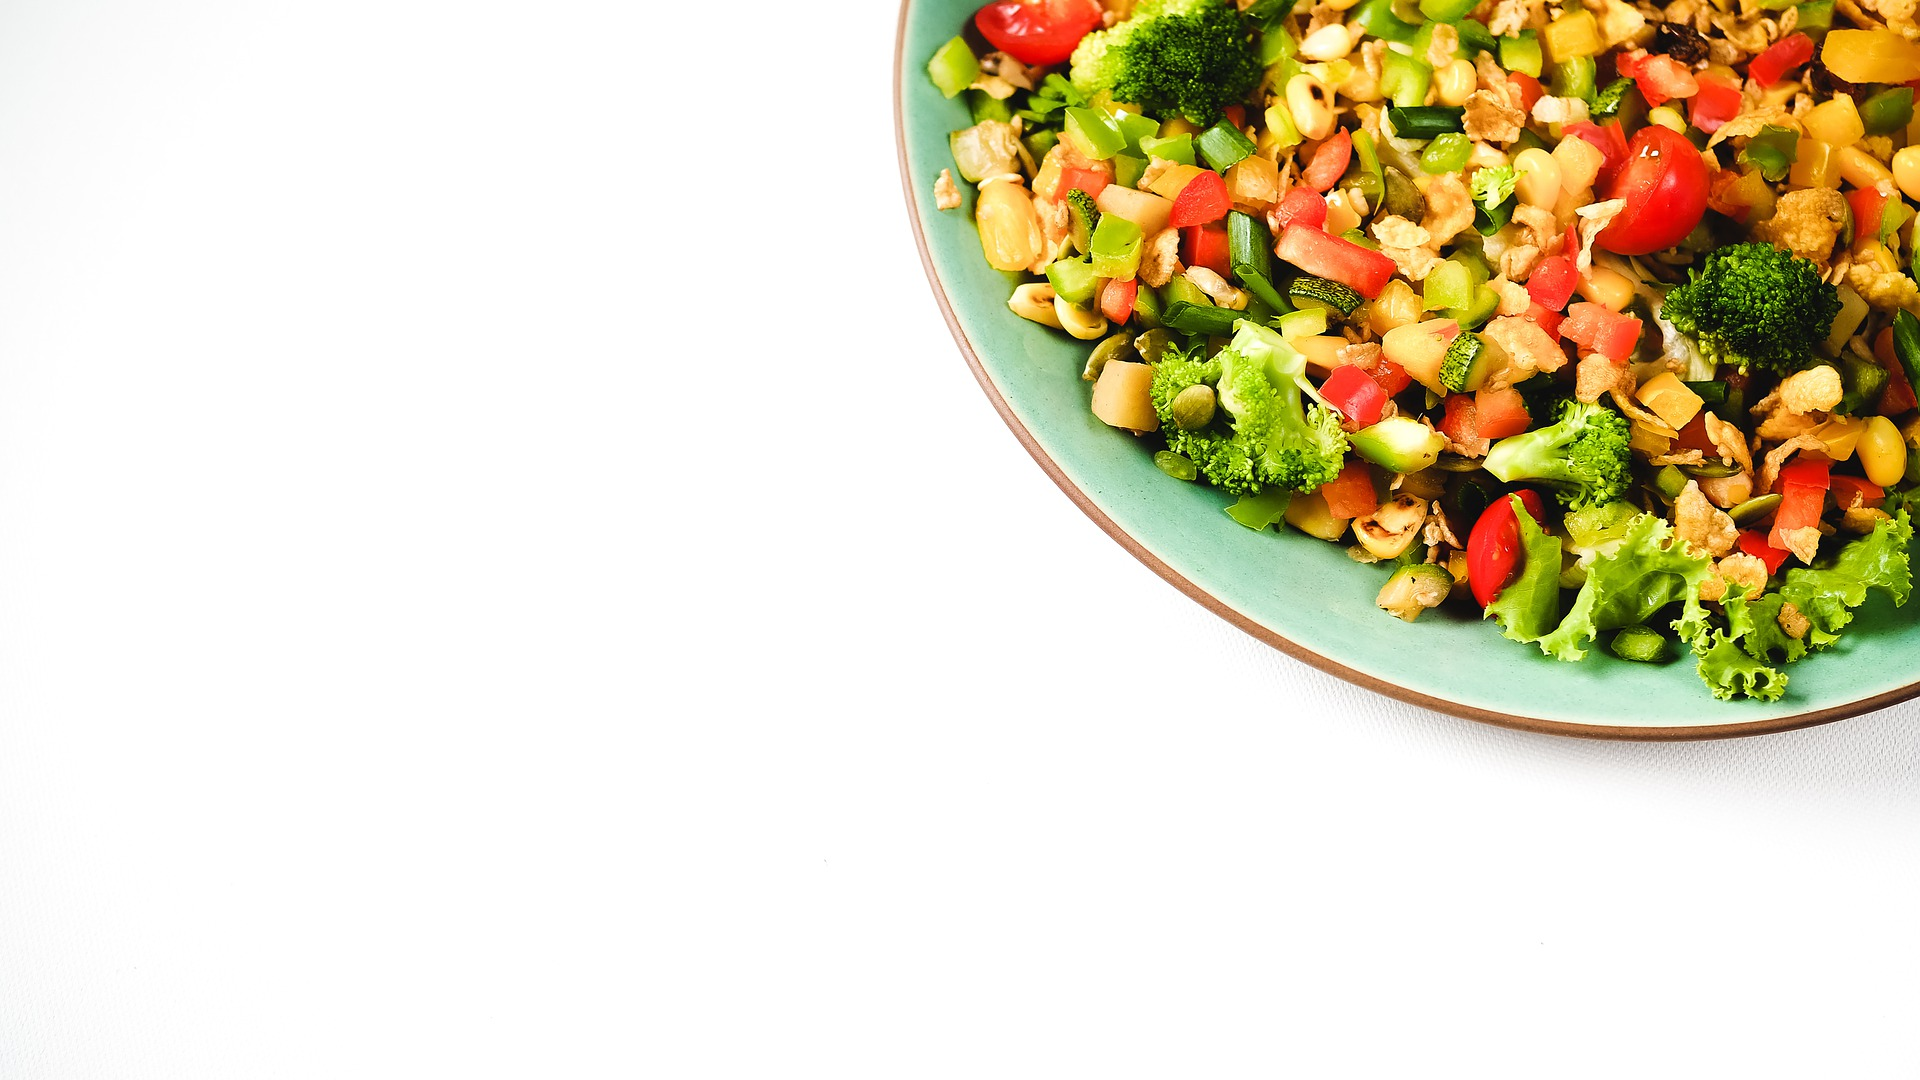 salad-4385142_1920